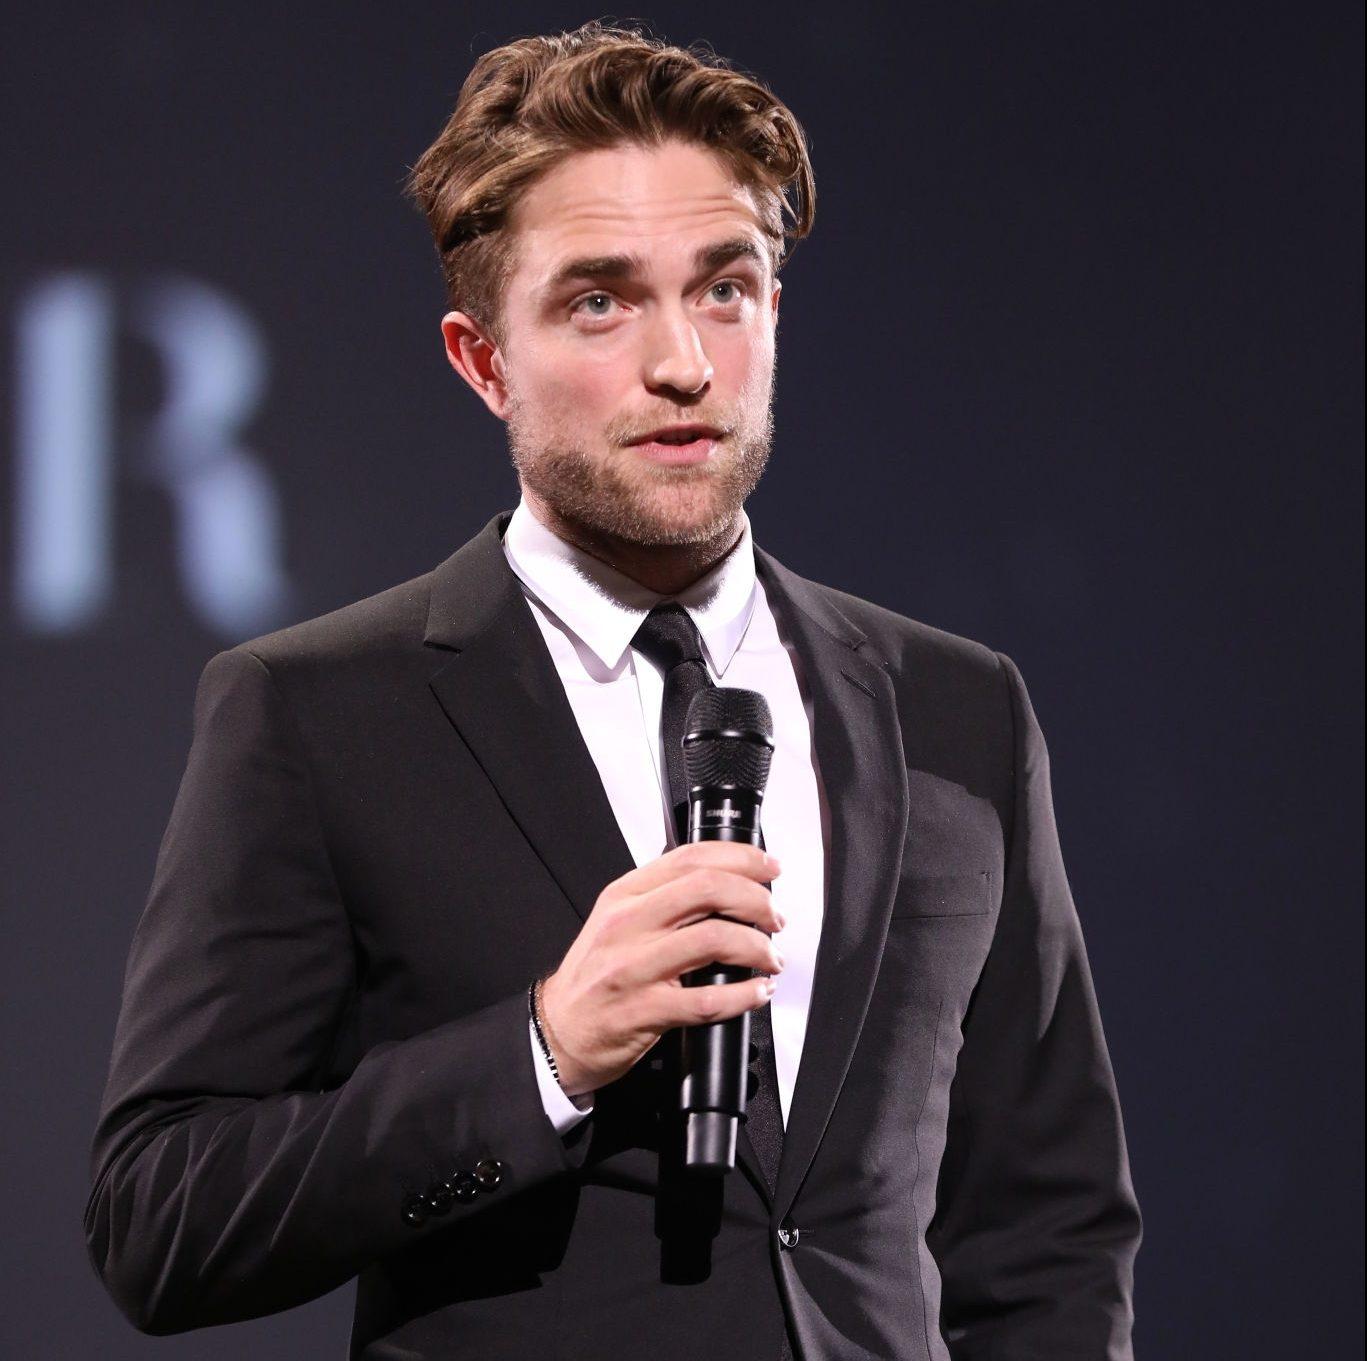 Fotos de Robert Pattinson no Fashion Awards